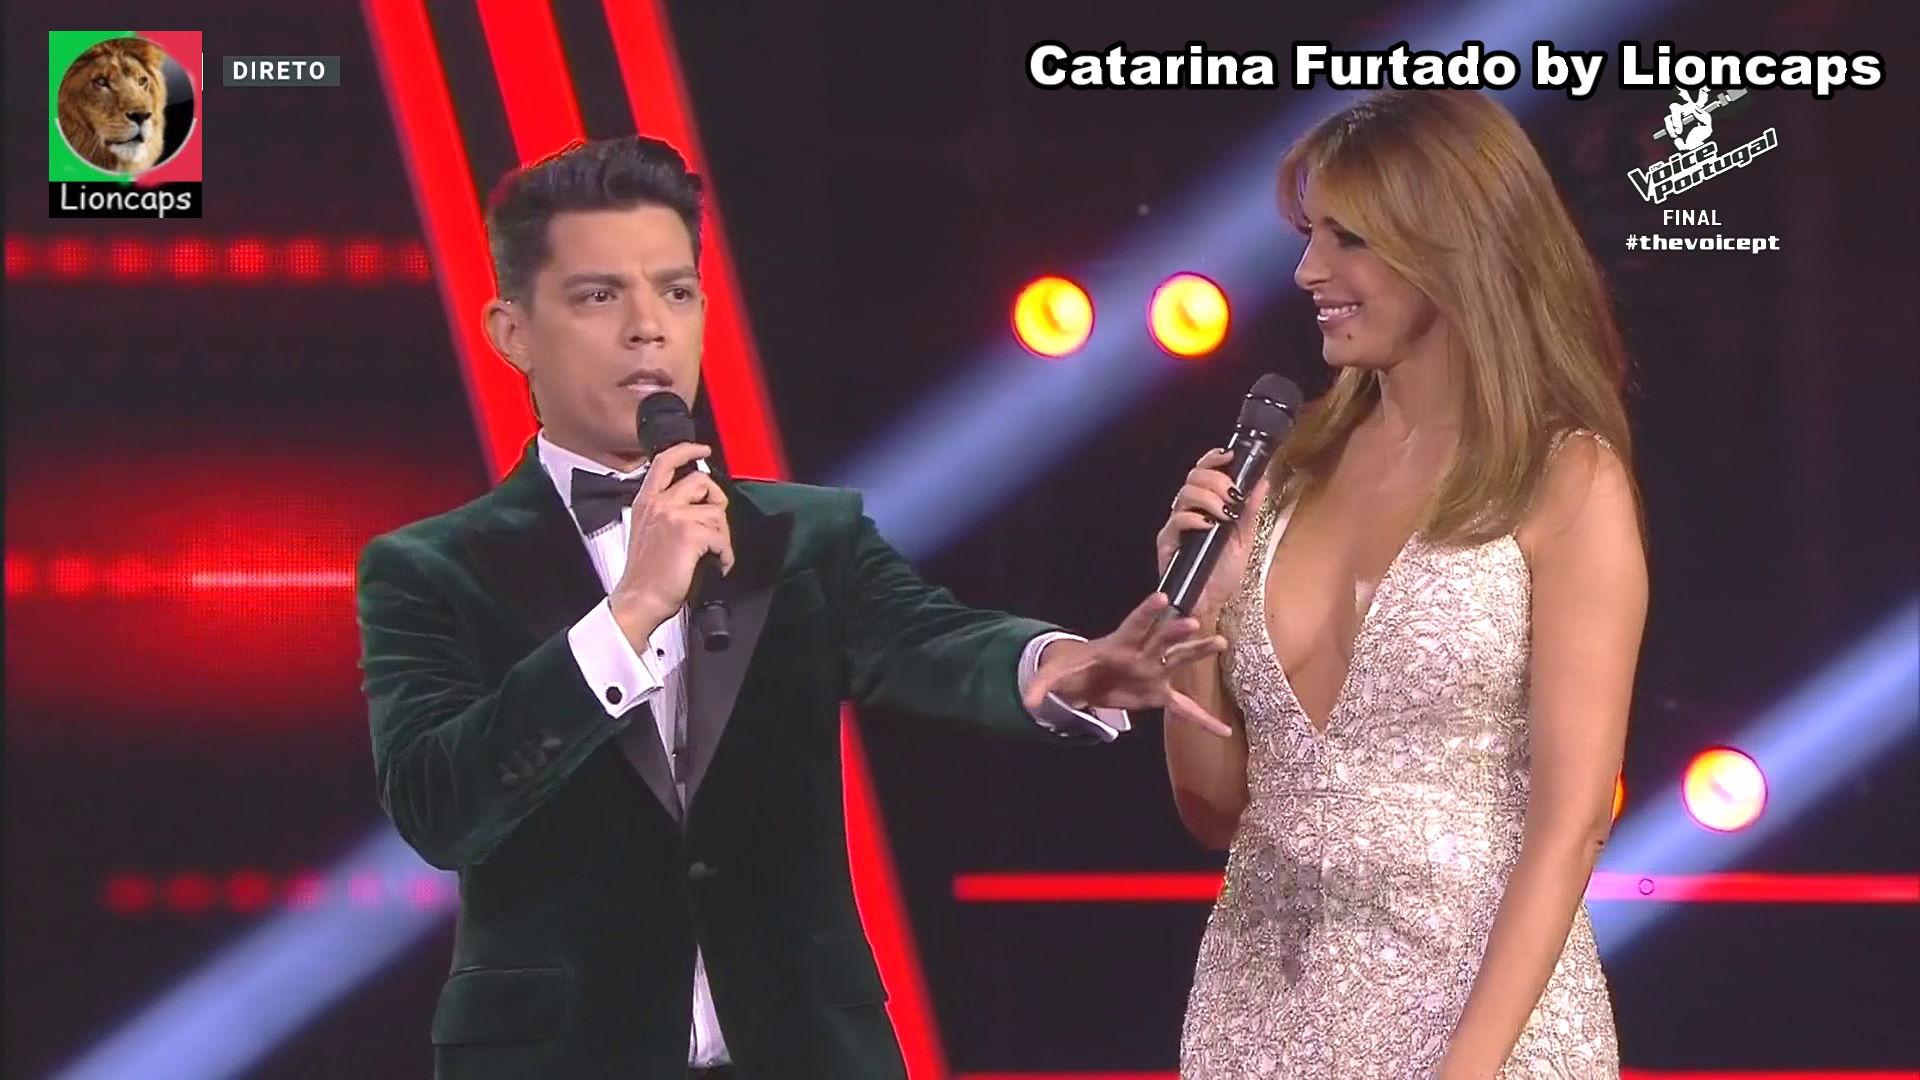 632055921_catarina_furtado_vs200122_0016_122_218lo.JPG